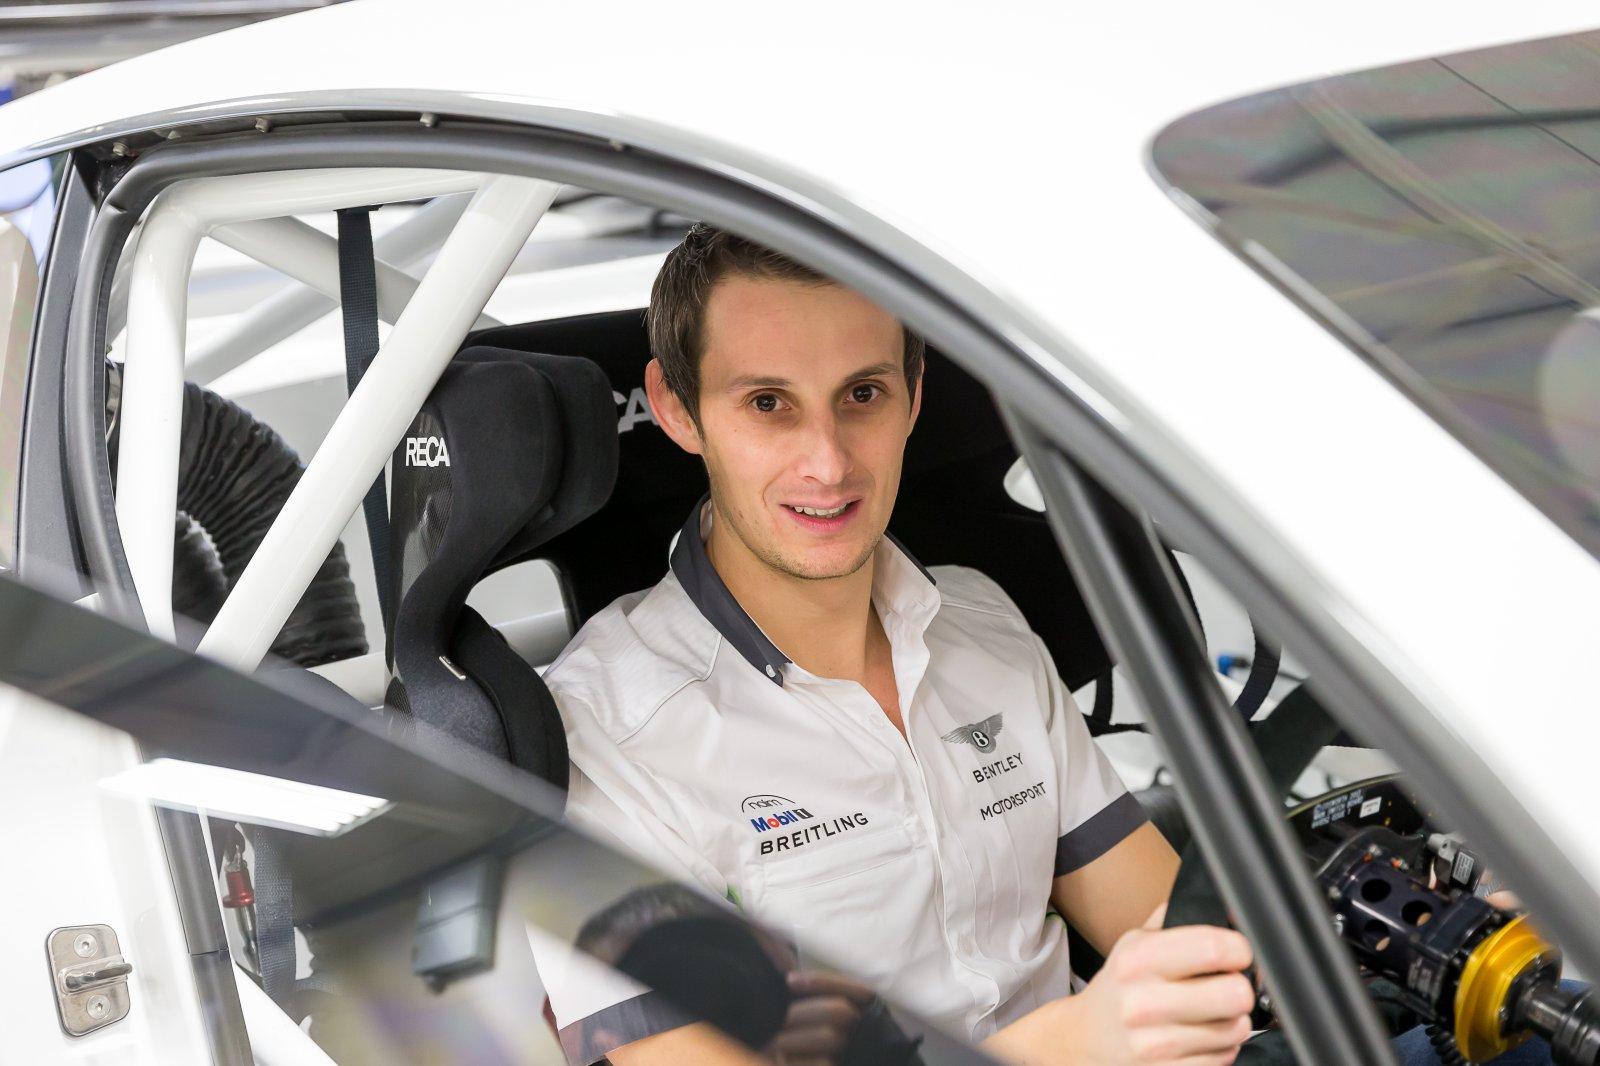 Bentley Motorsport signs British racing driver Oliver Jarvis